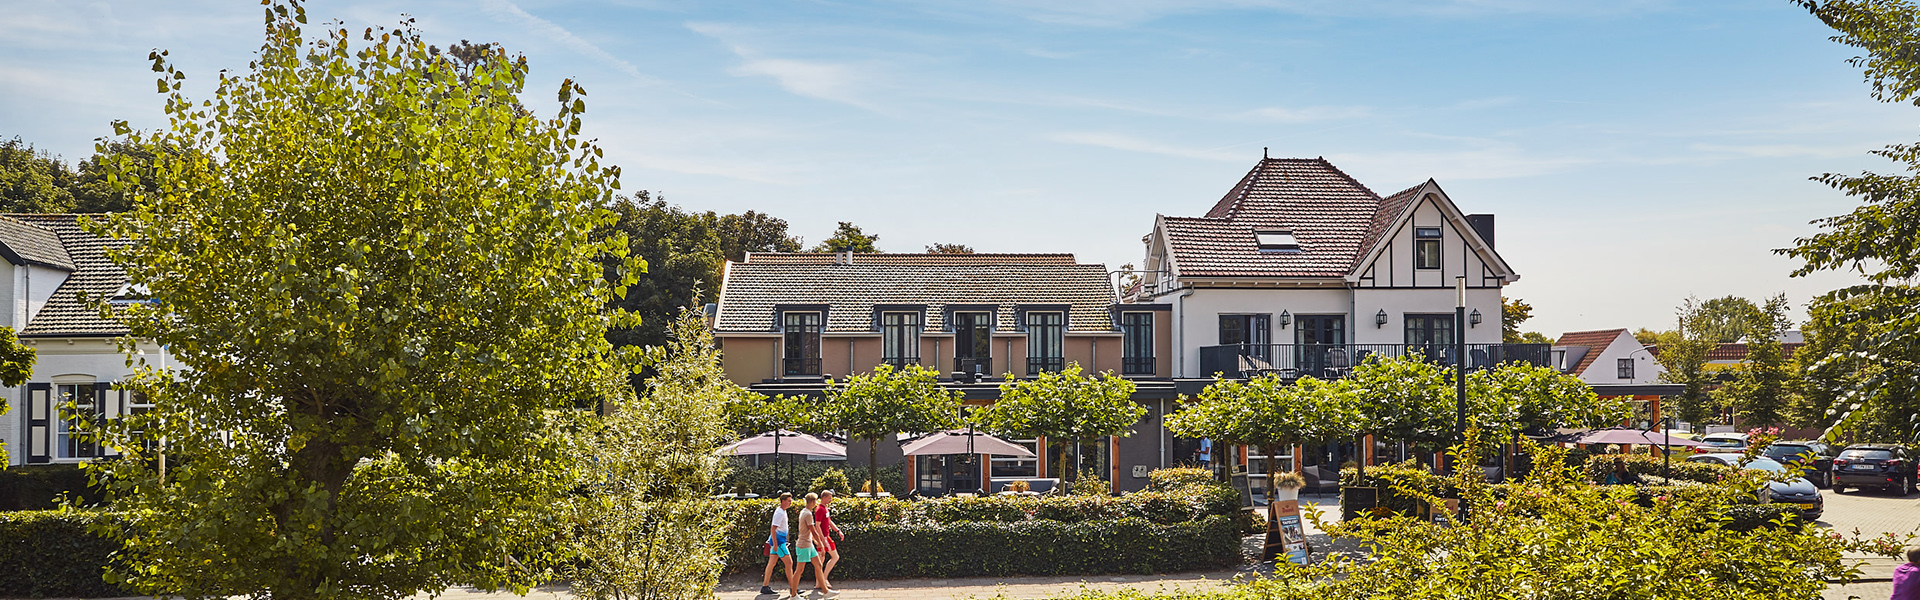 Badhotel Renesse - terras